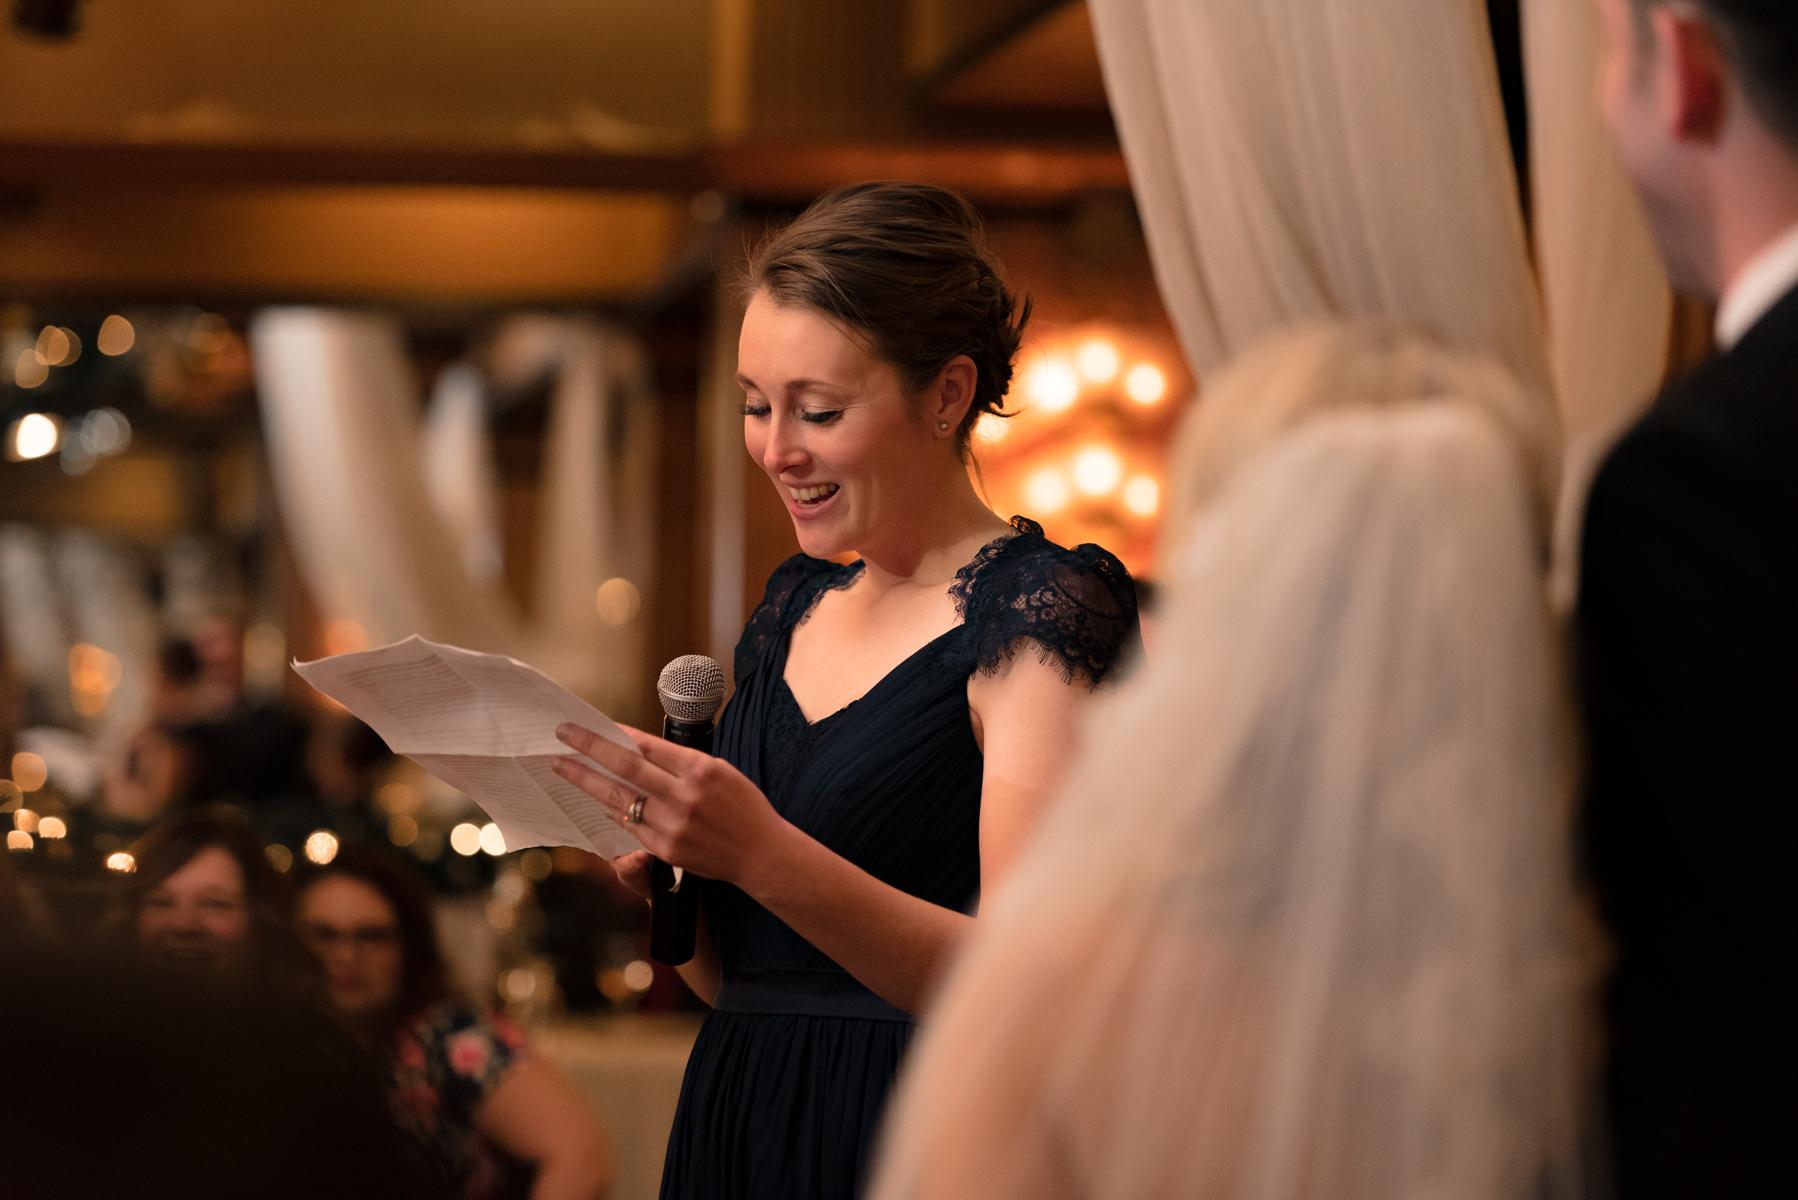 Andrew Tat - Documentary Wedding Photography - Lake Union Cafe - Seattle, Washington -Rachel and Ryan - 41.jpg